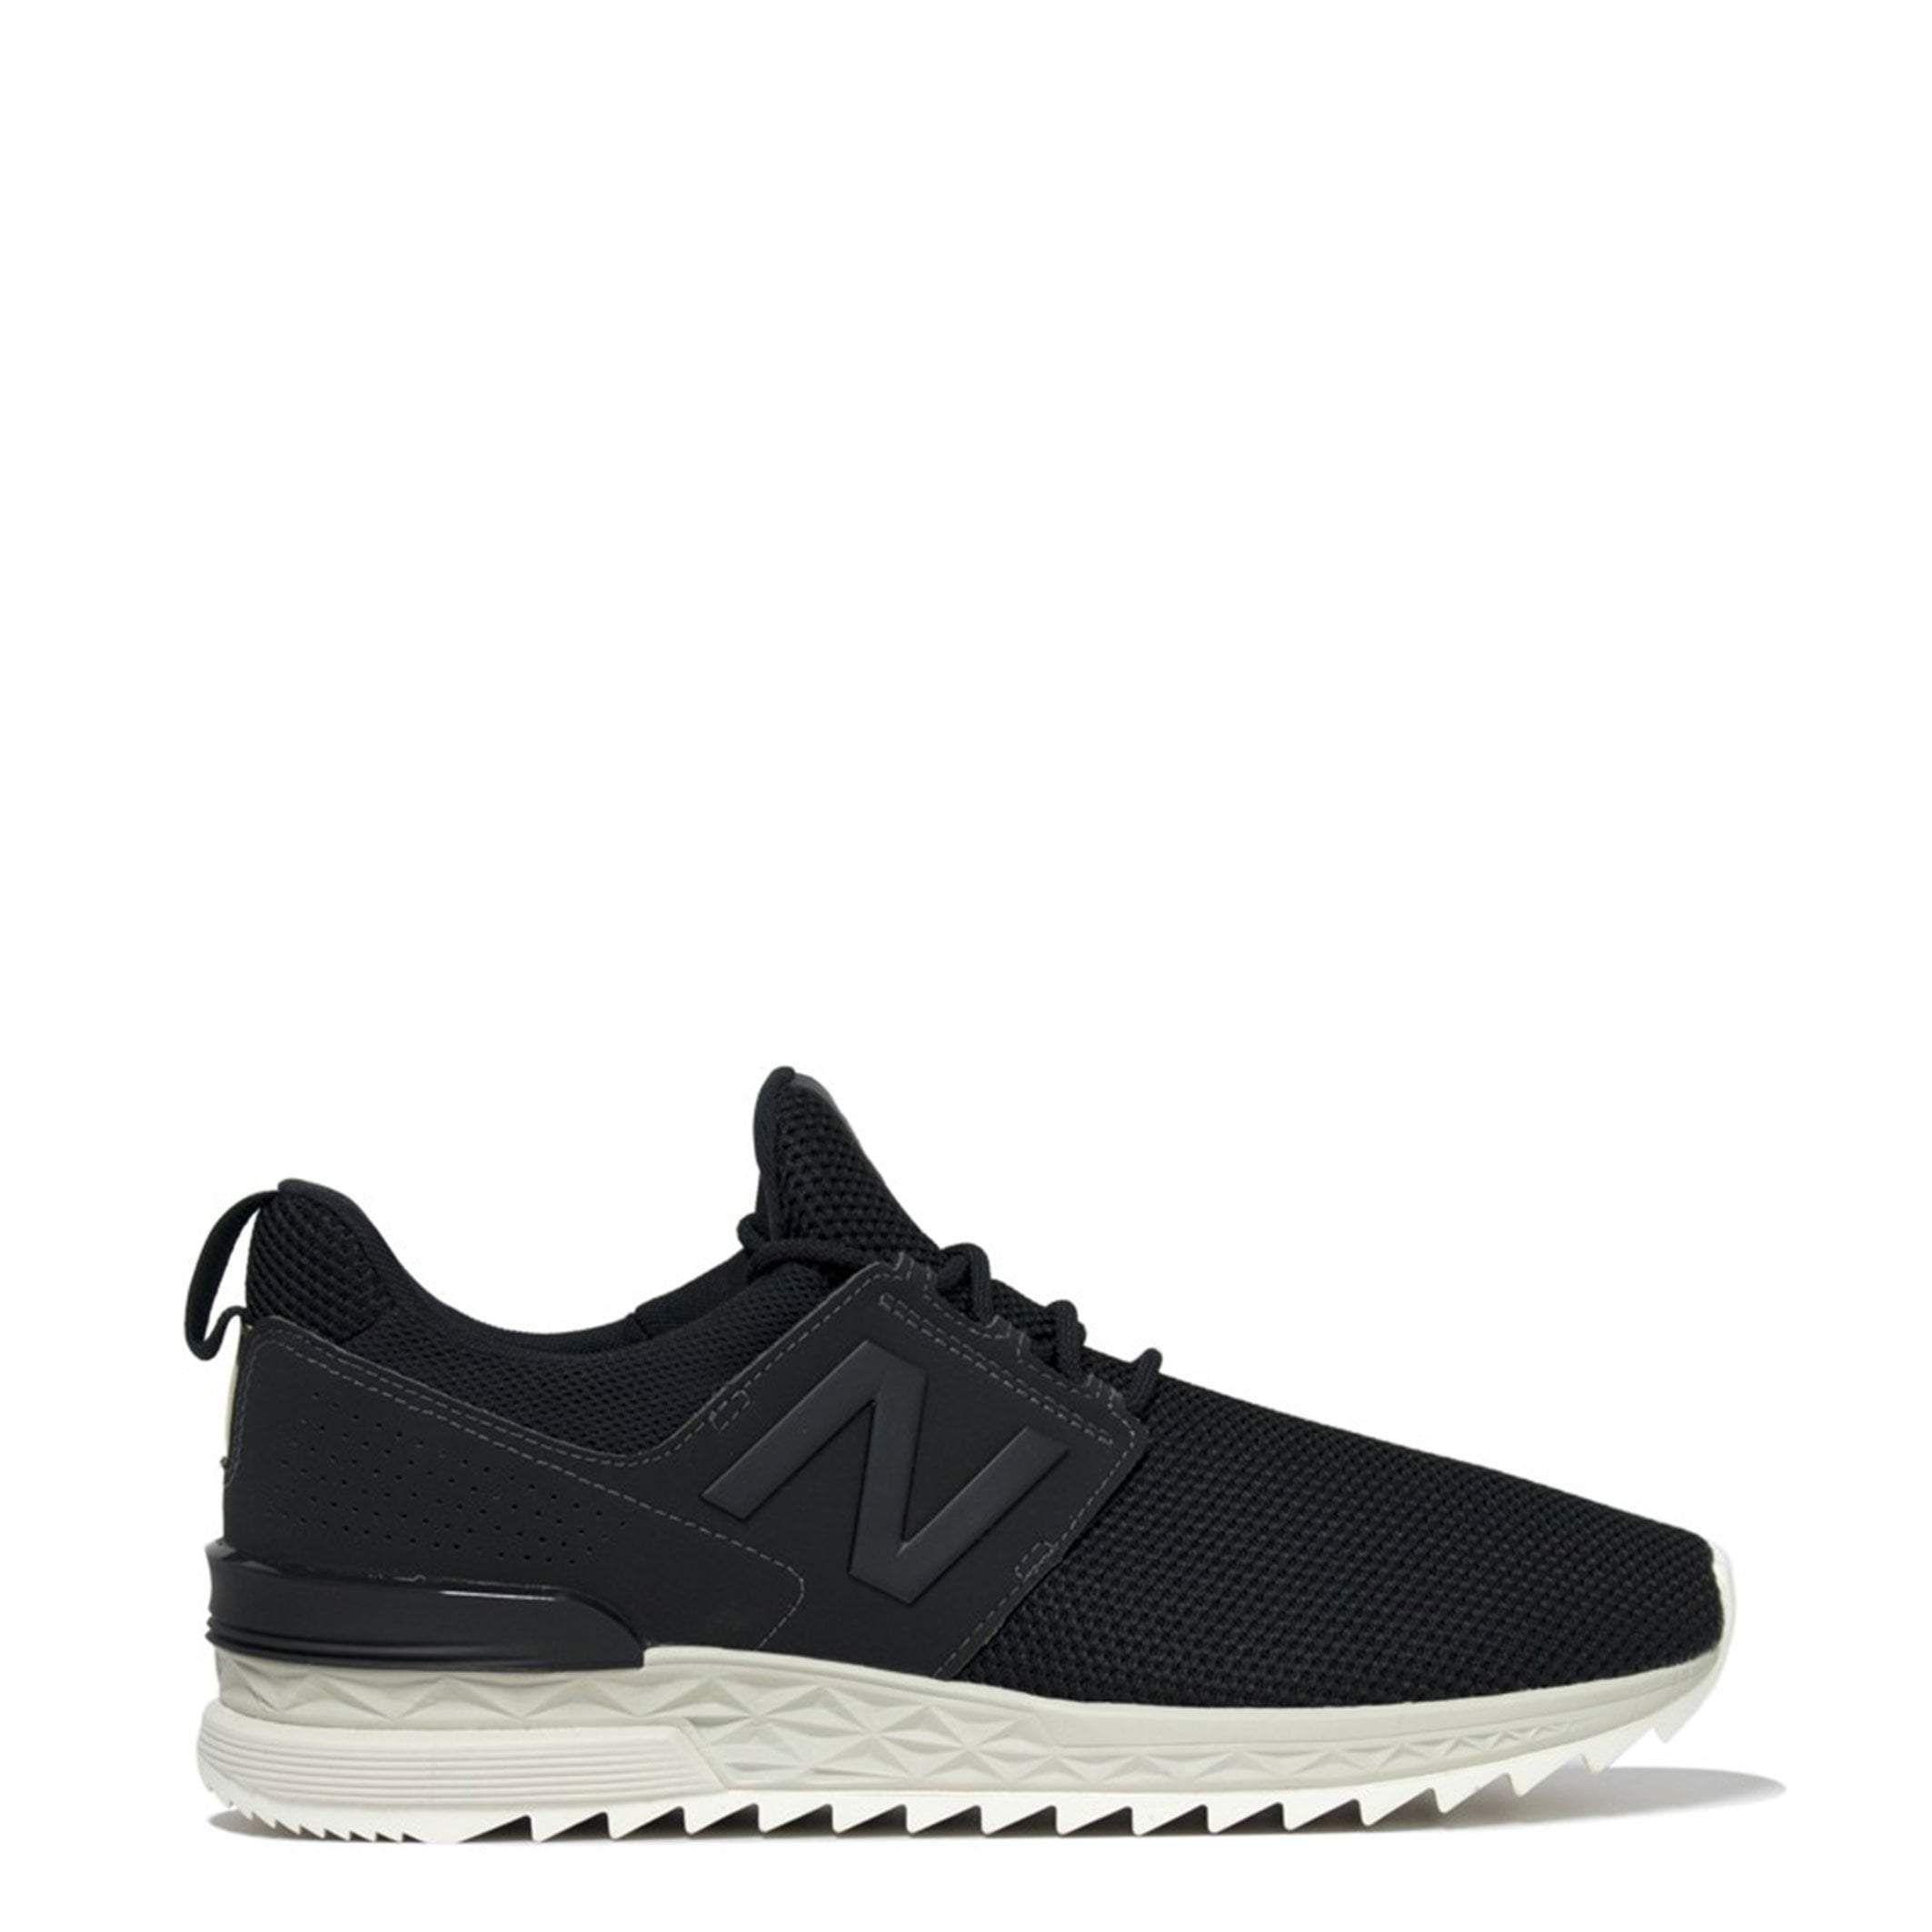 best website c78f9 58790 New Balance Men Black Sneakers. New Balance MS574 Sneakers - Black